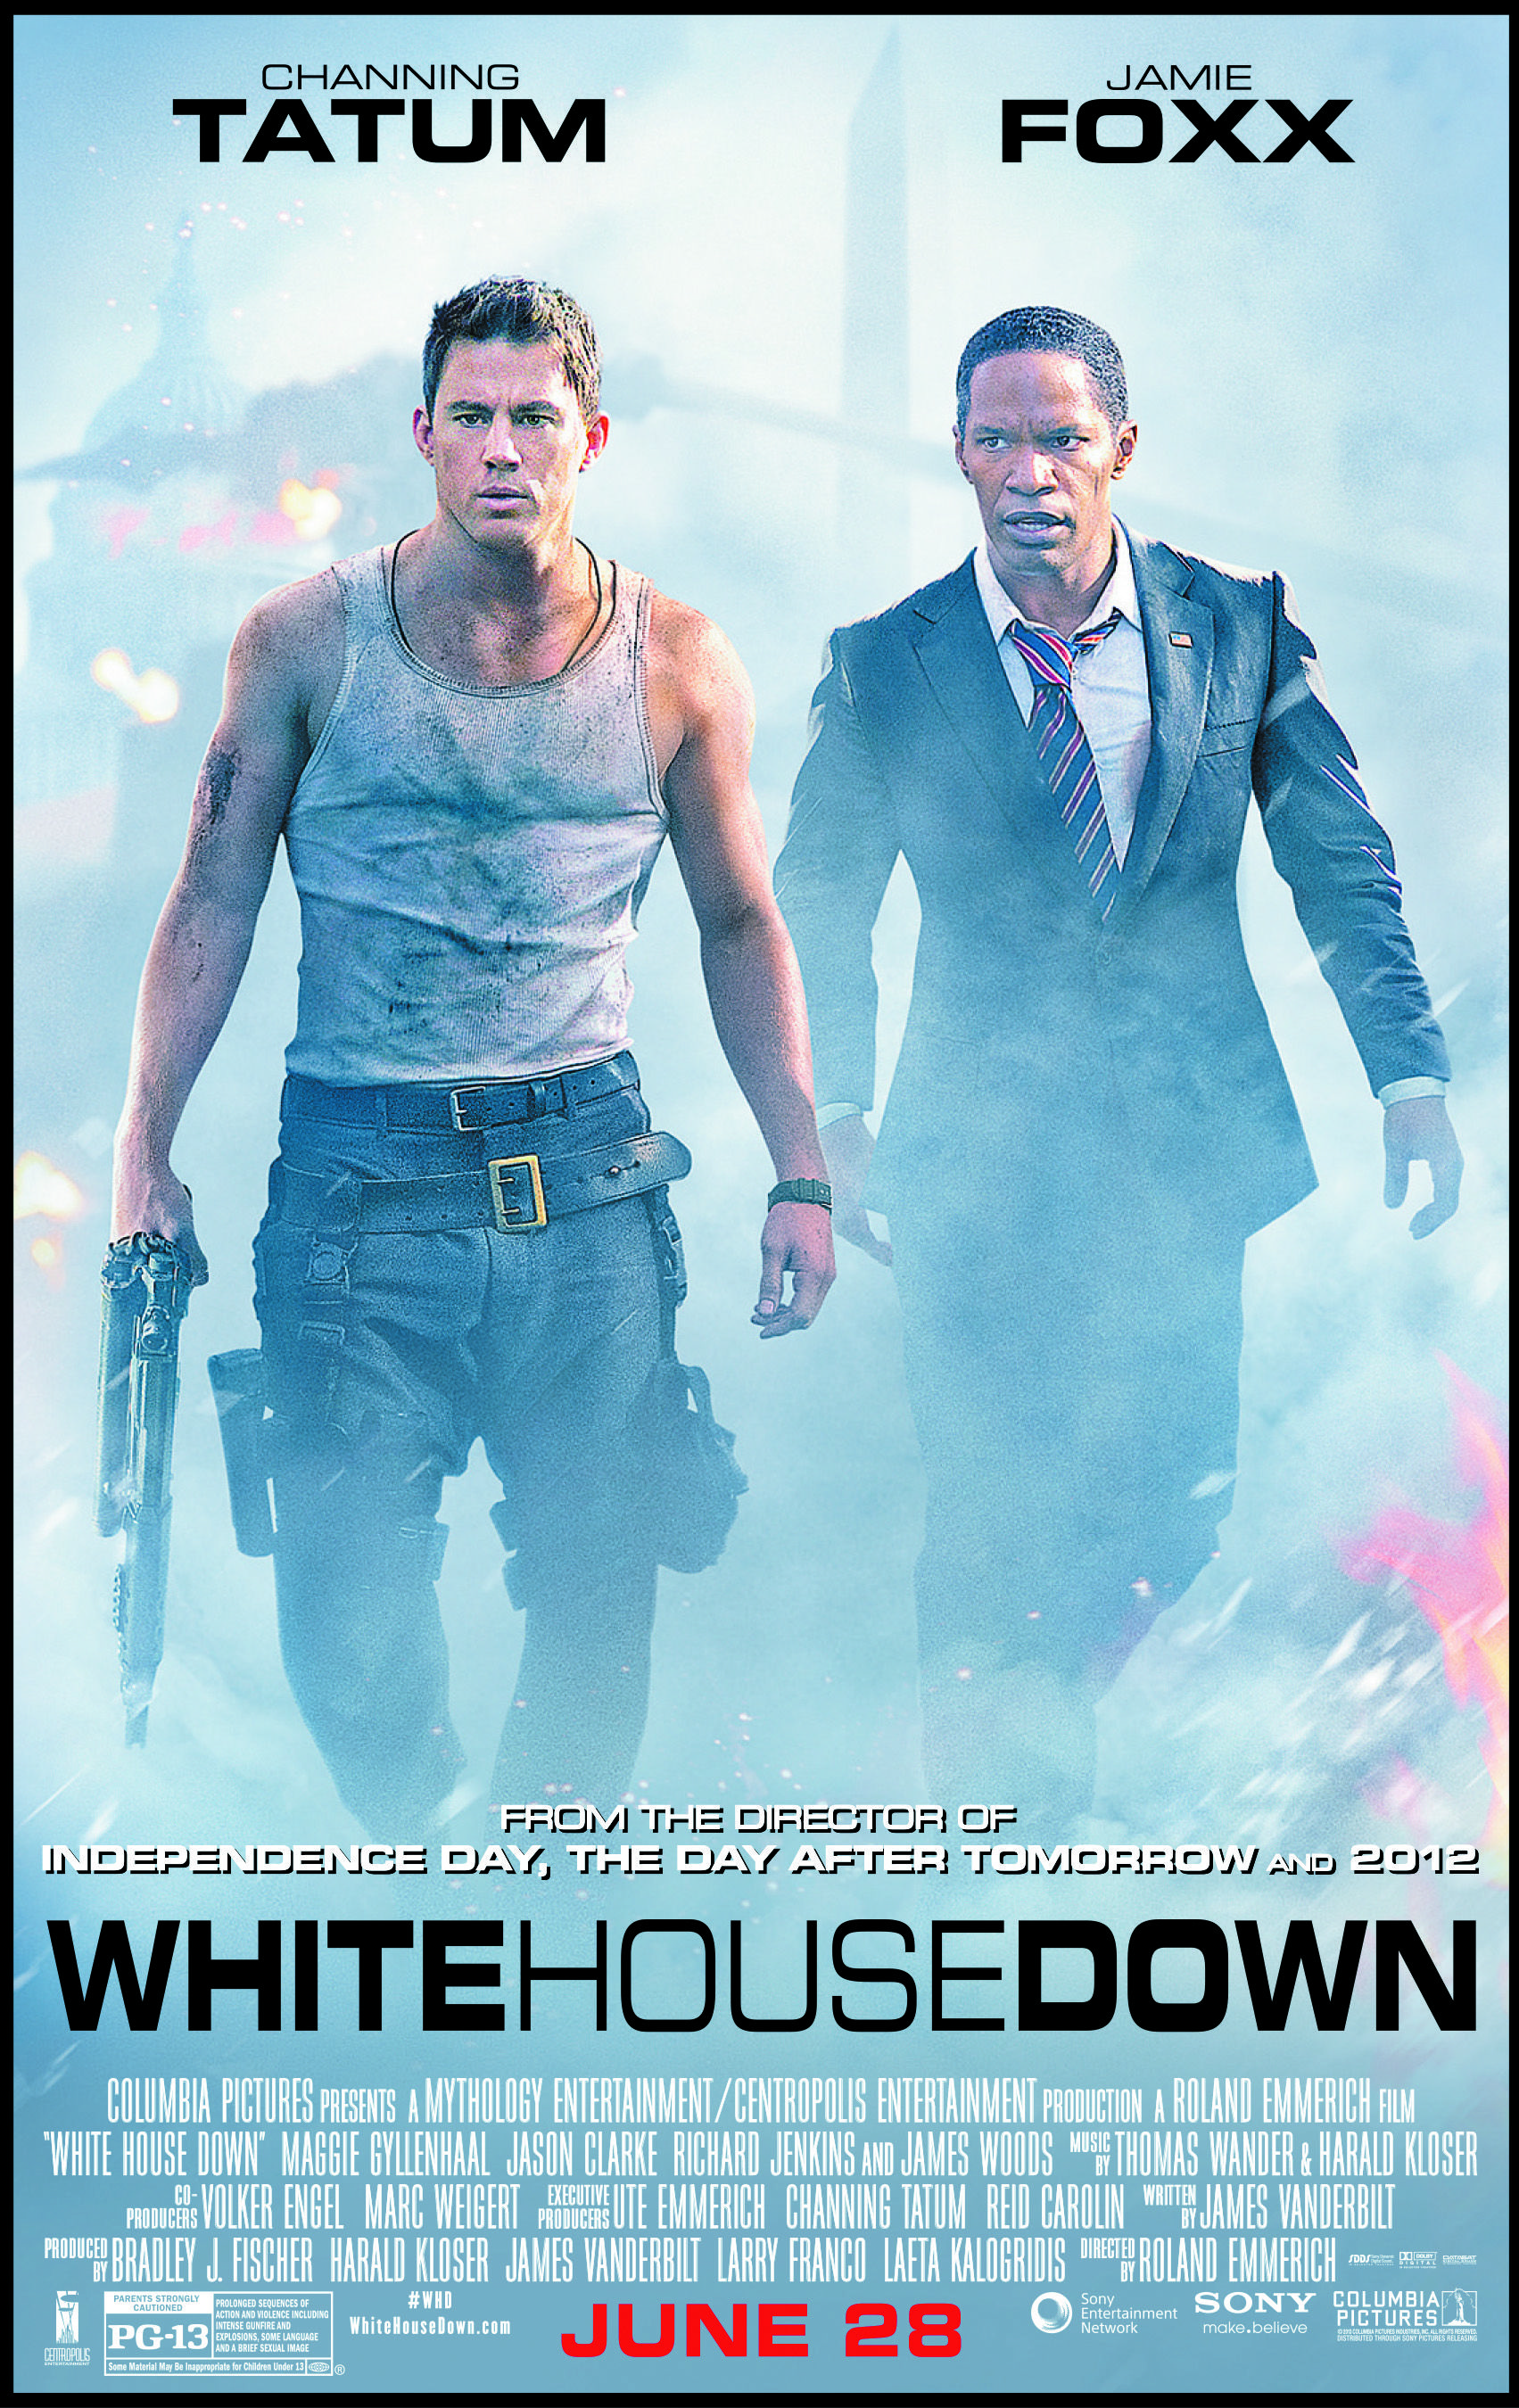 White House Down Final Poster Avec Images Film Film D Action